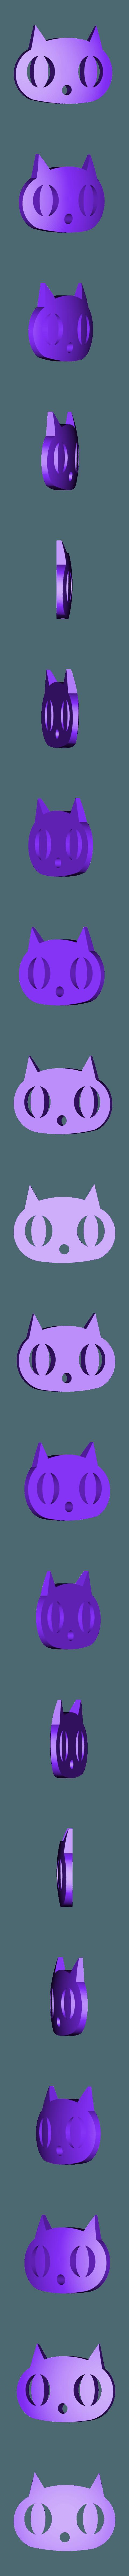 Cat.stl Download free STL file Visions of Halloween Danced In Her (His) Head, Hand Cranked • 3D printing model, gzumwalt